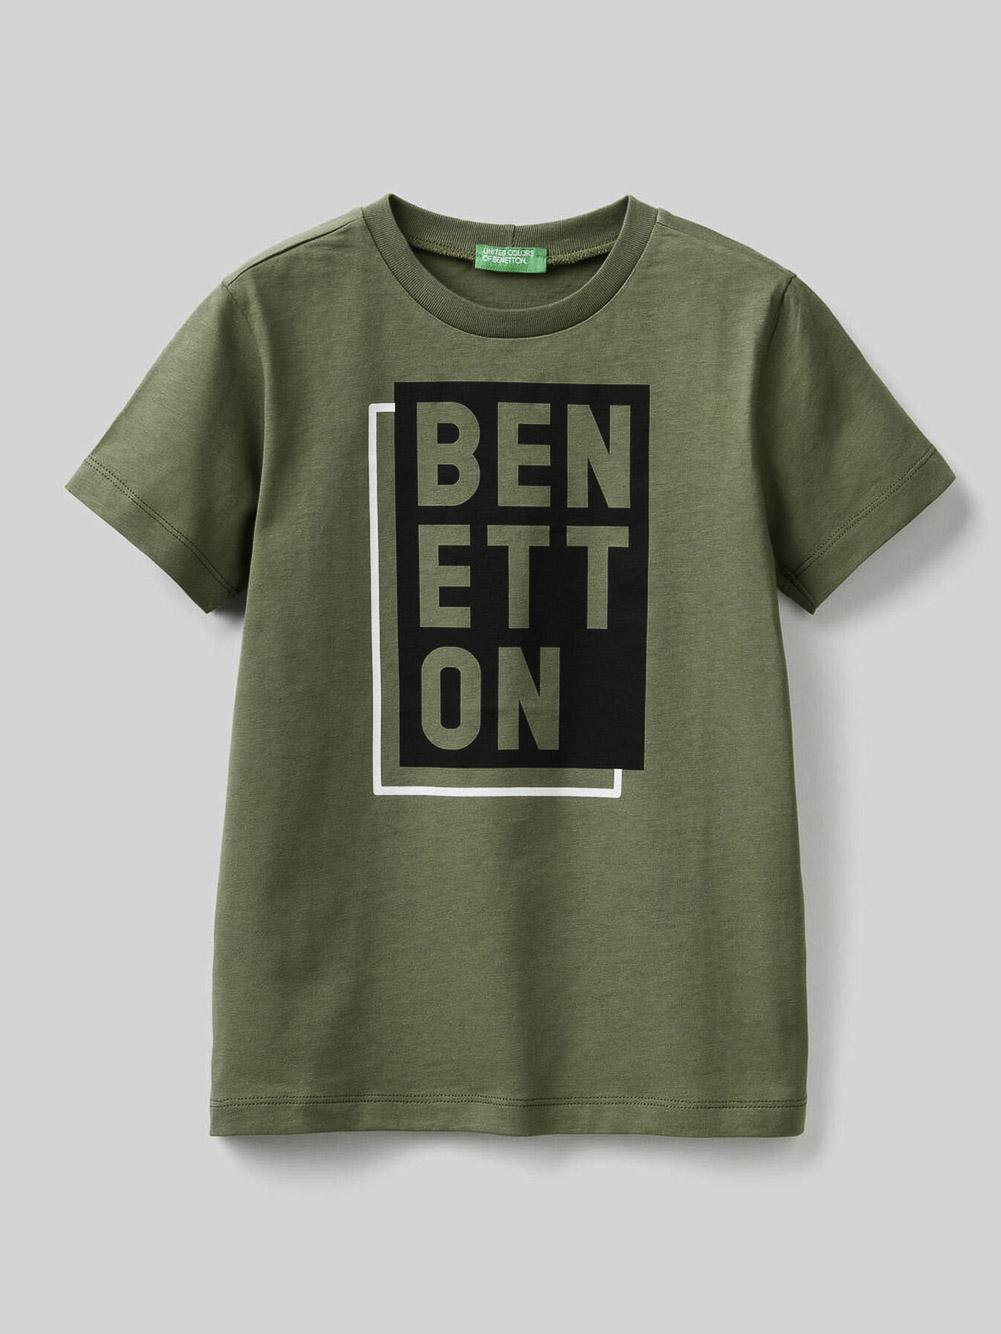 012 BENETTON T-SHIRT G 3096C151T 21P07N